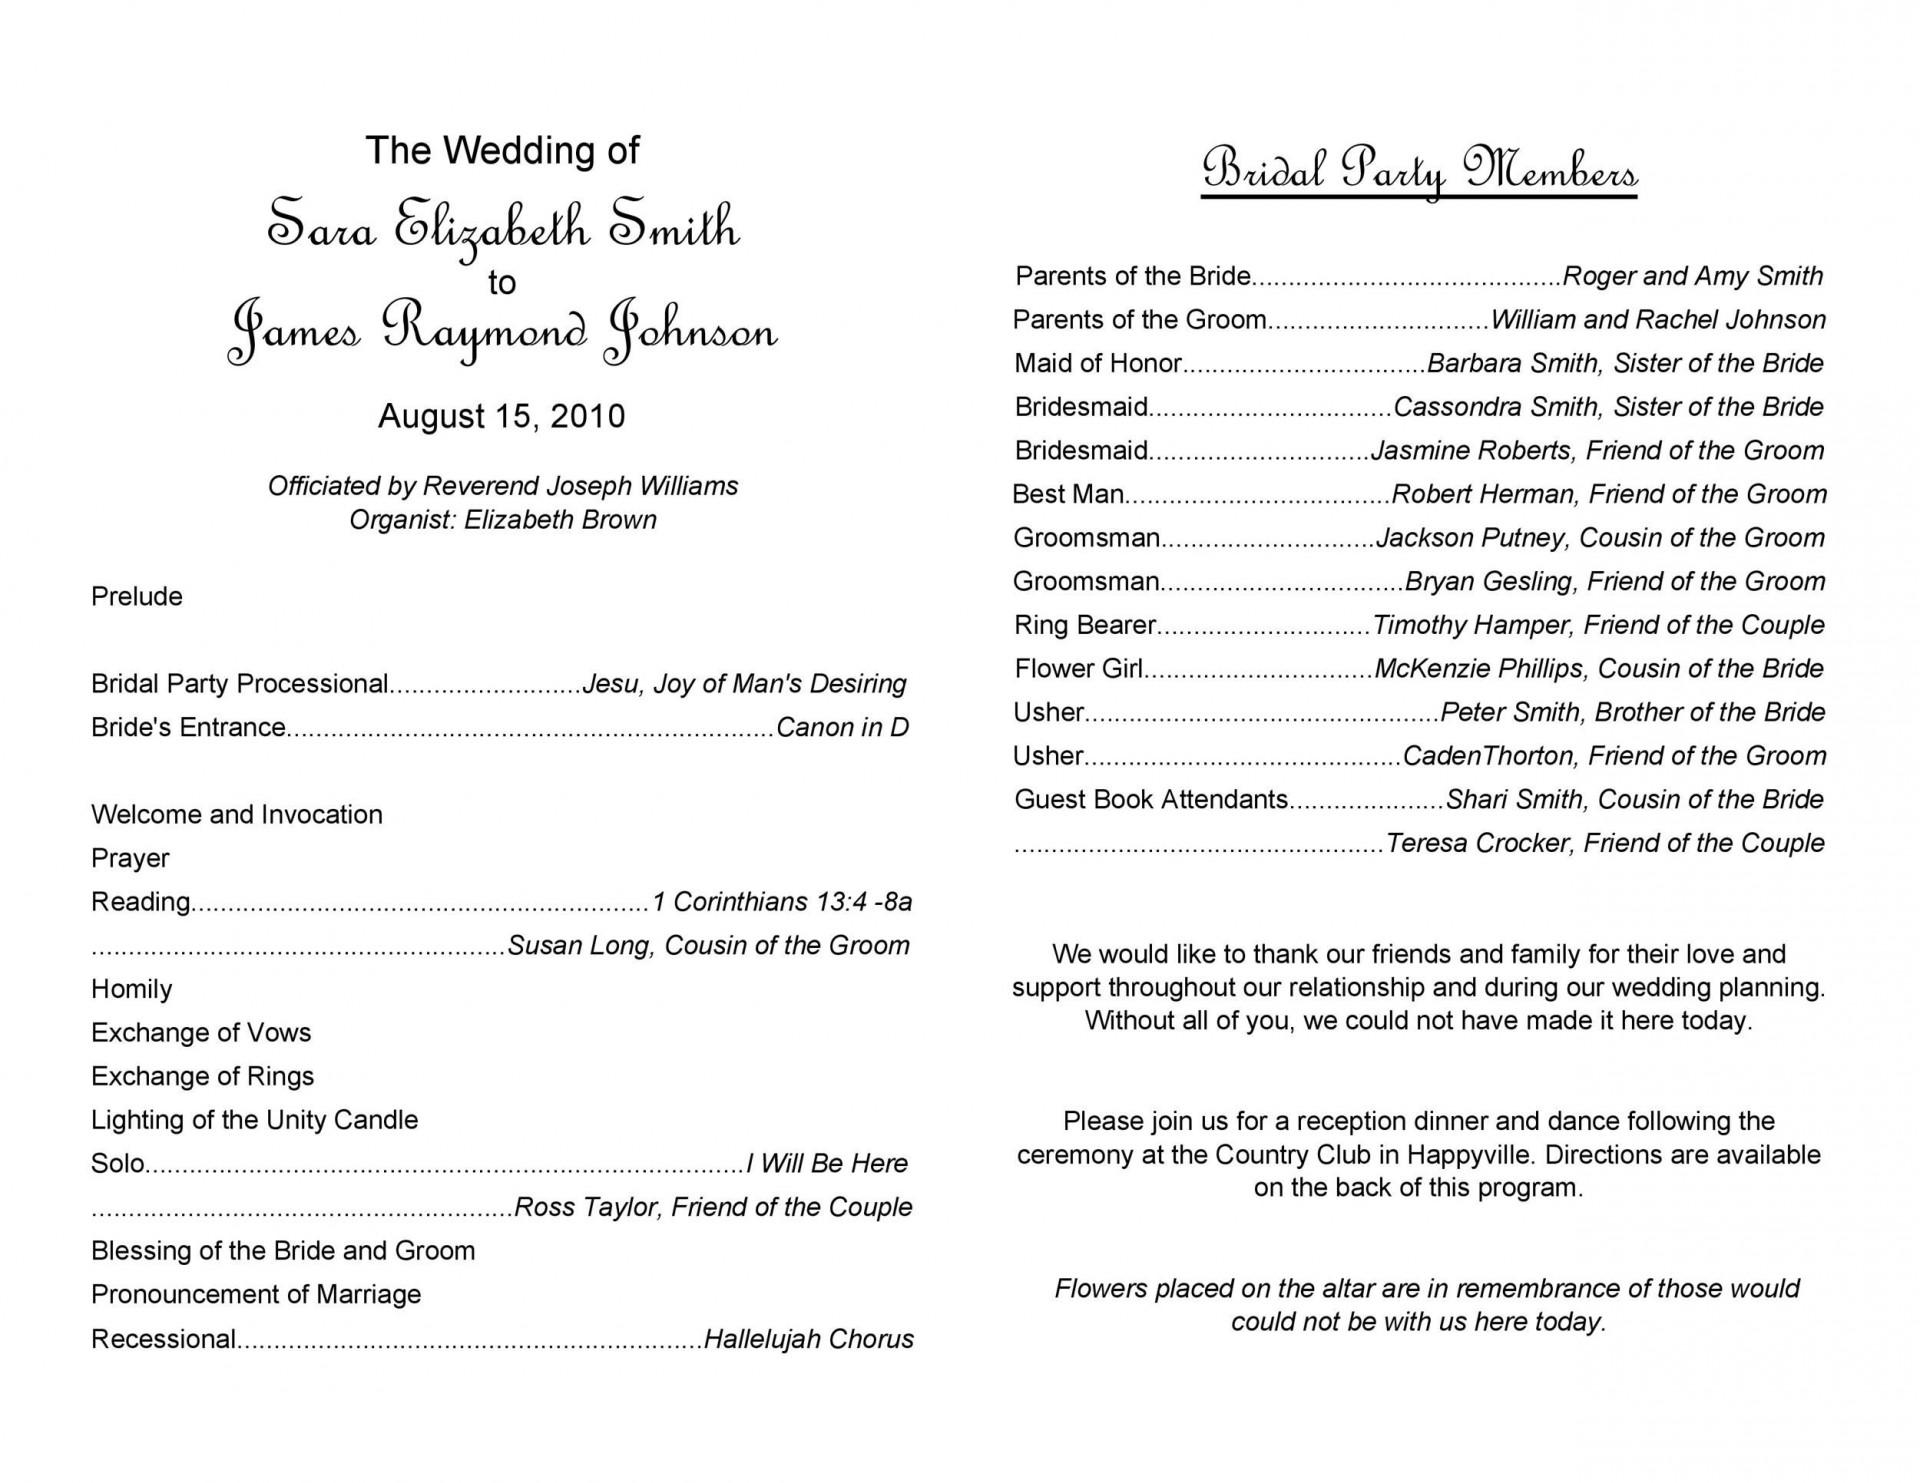 009 Stunning Wedding Program Template Free Concept  Fan Download Elegant1920